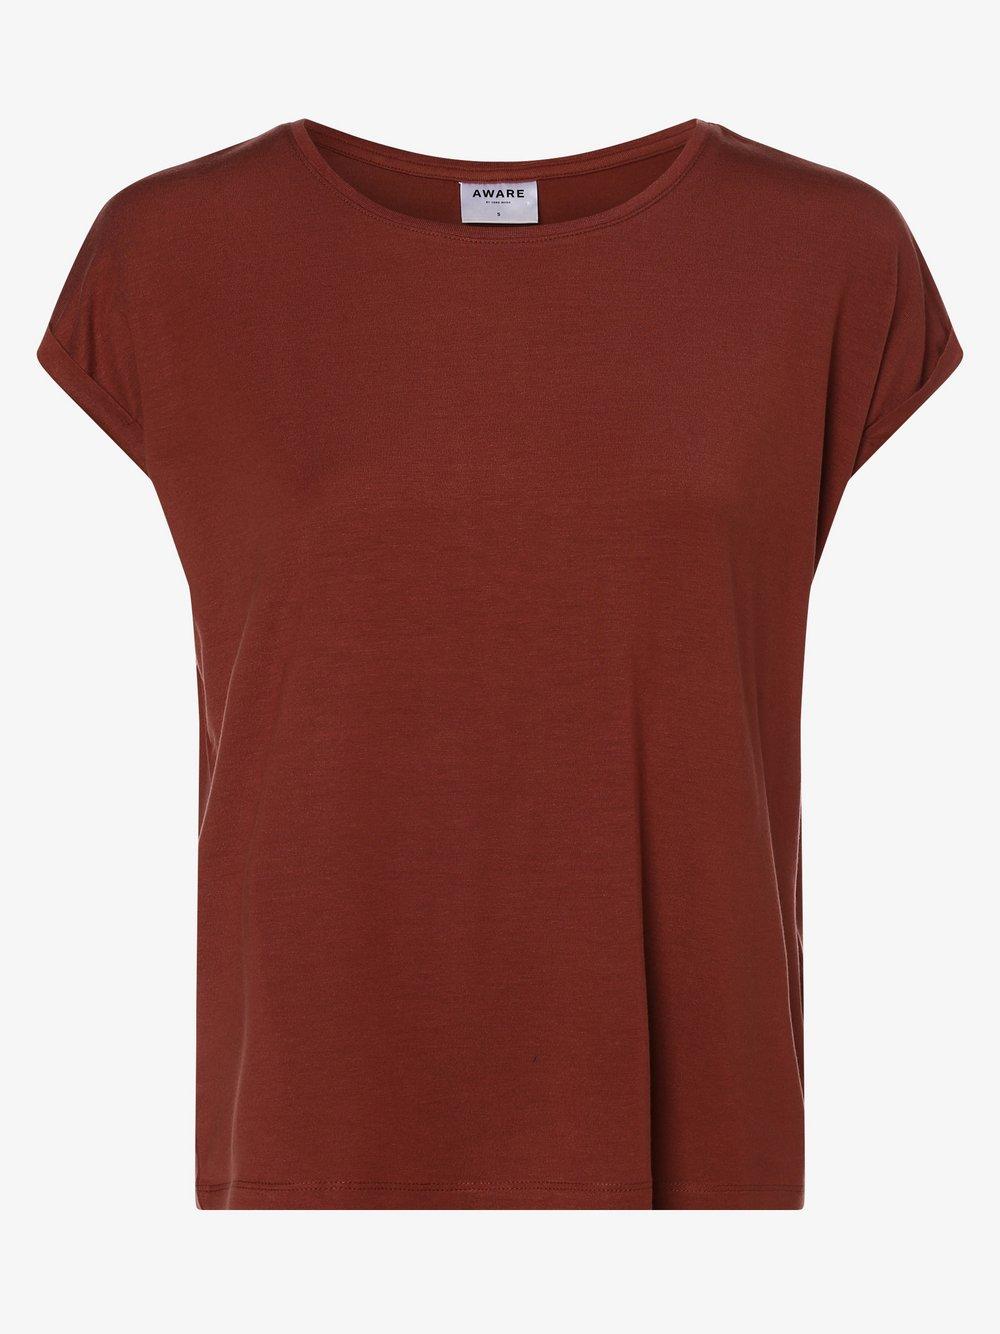 Vero Moda - T-shirt damski – Vmava Plain, czerwony